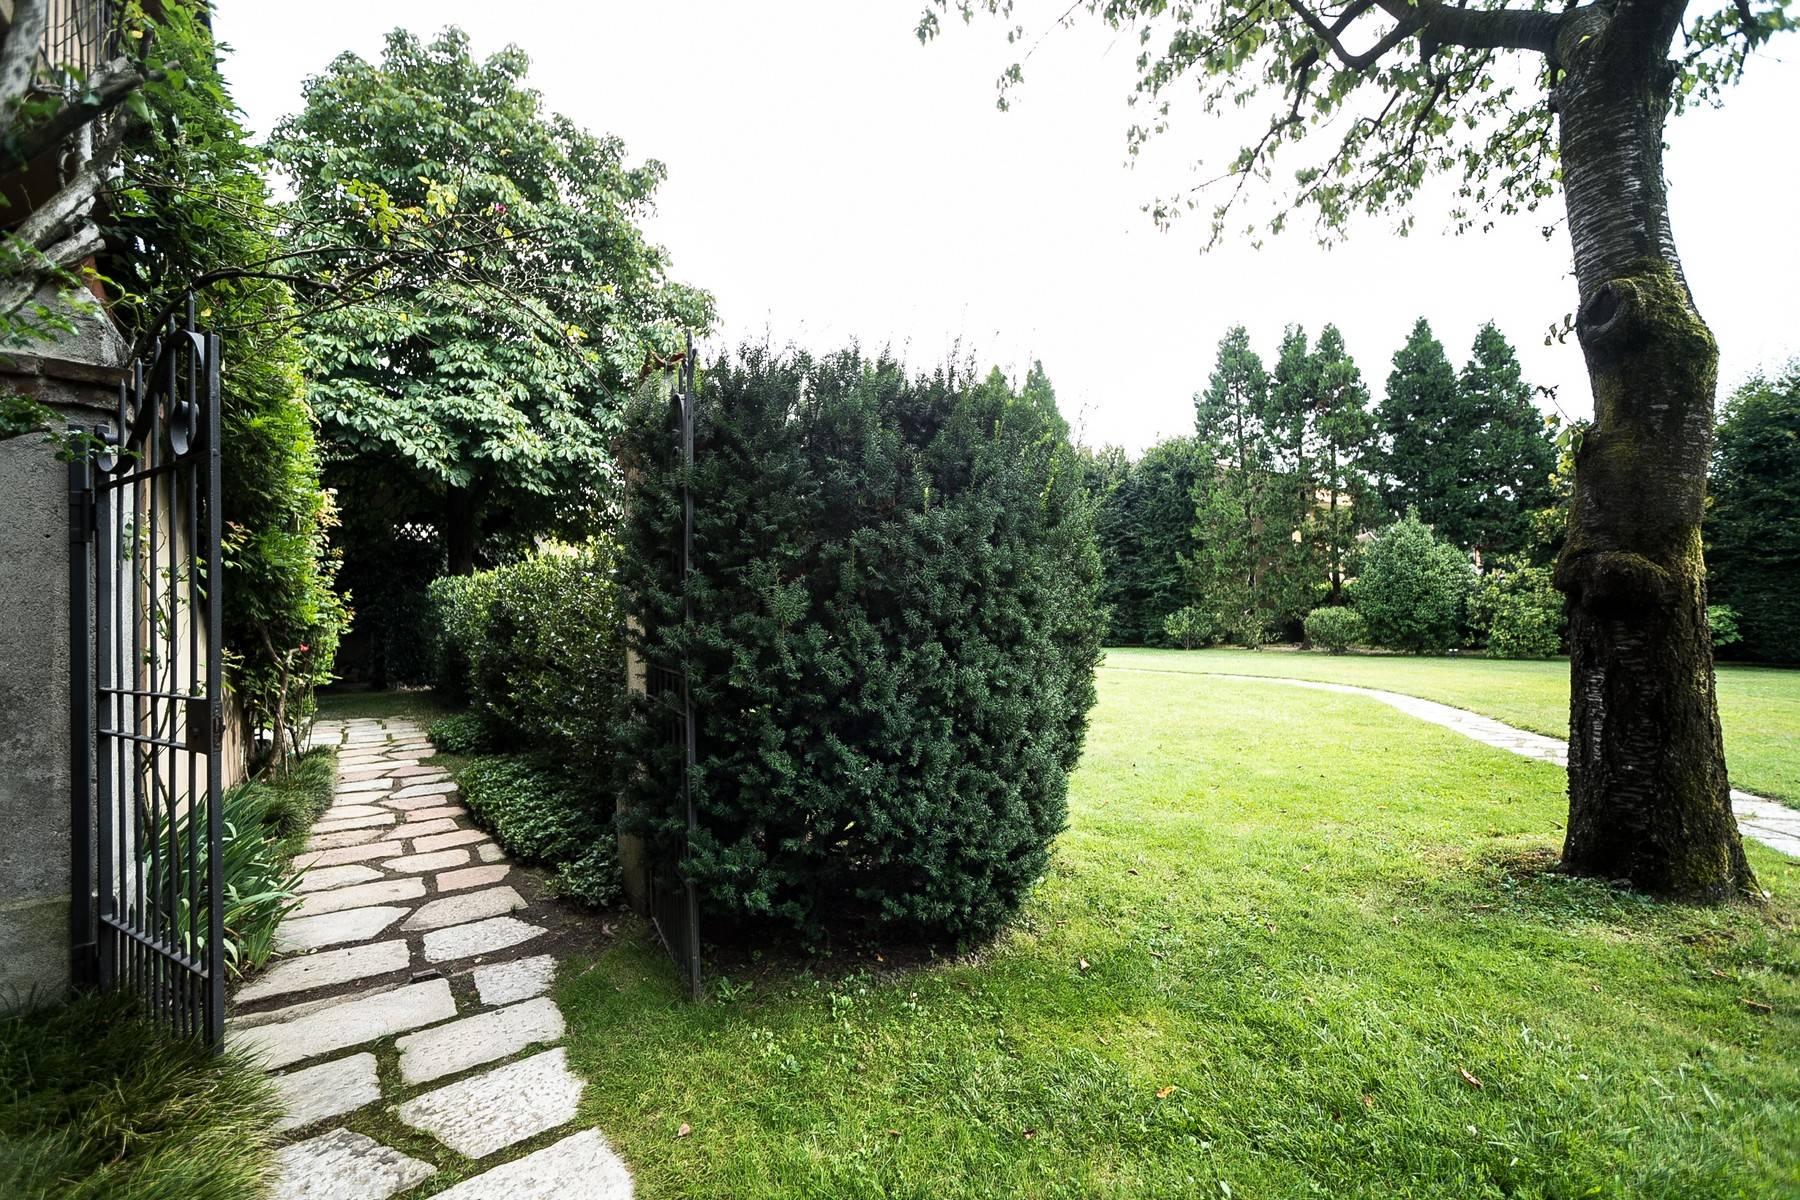 Villa in Vendita a Carimate: 5 locali, 800 mq - Foto 8